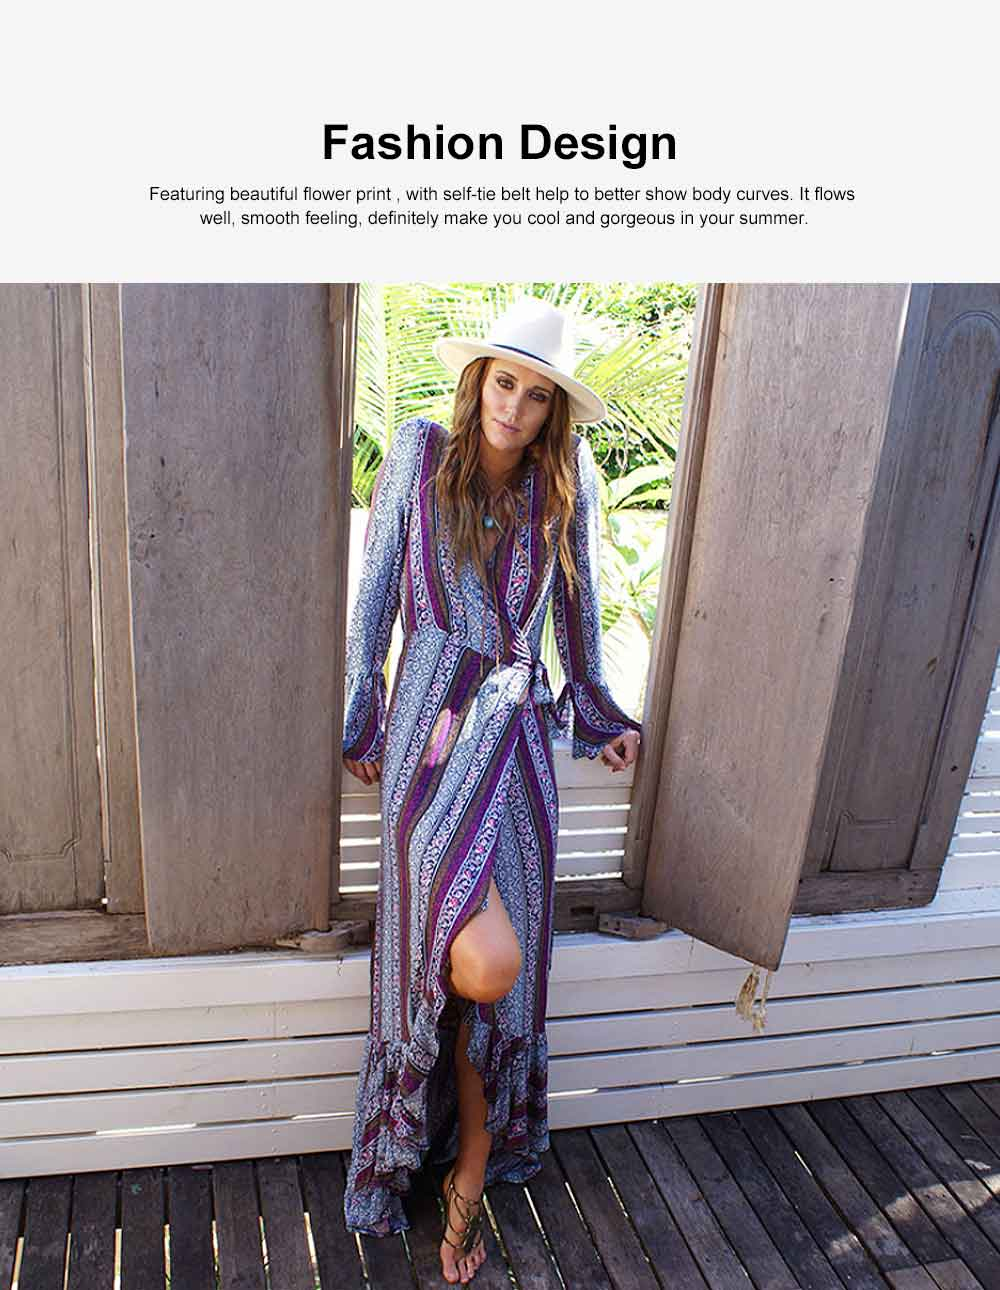 Women Large Size Long Dress, Floral Printed Maxi Dress Deep V-neck Irregular Dresses, Beach Dresses Bohemian Side Split Dresses 2